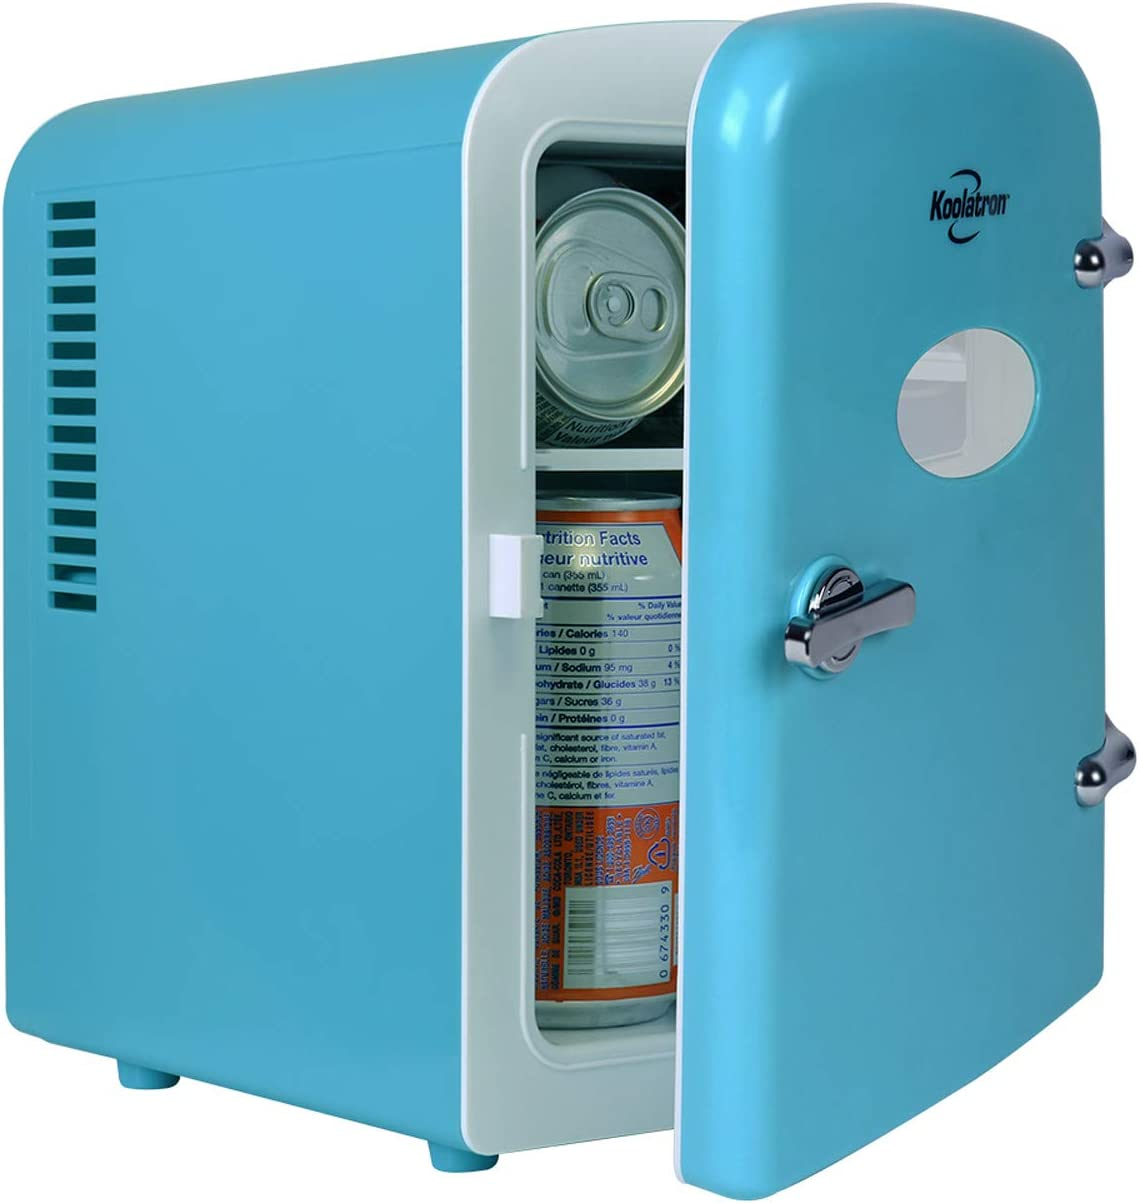 Koolatron KRT04 Mini Fridge Cooler And Warmer Portable ...